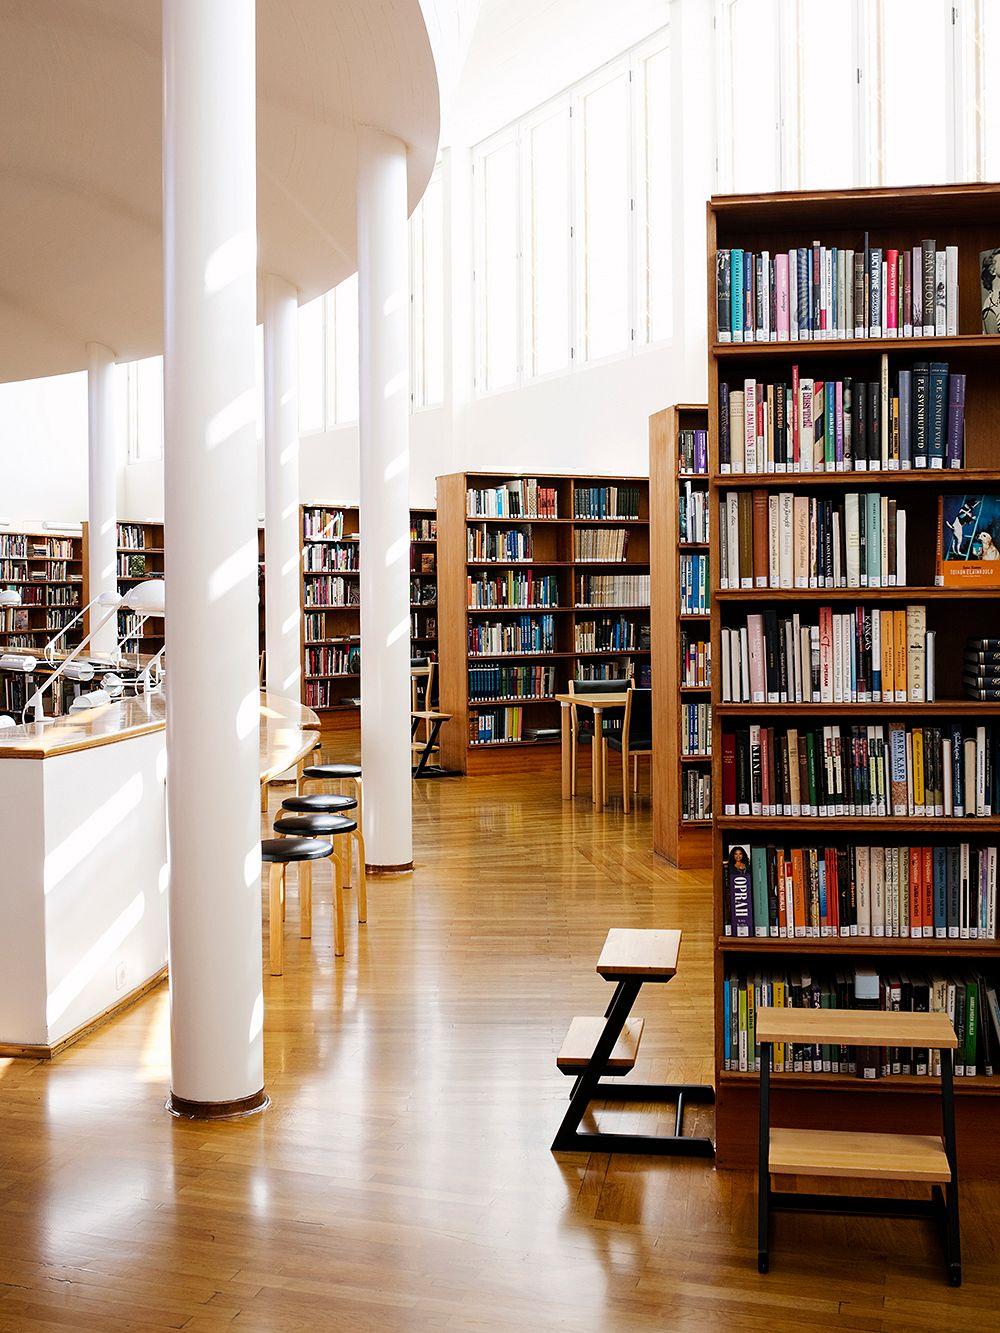 Seinäjoki library by Alvar Aalto